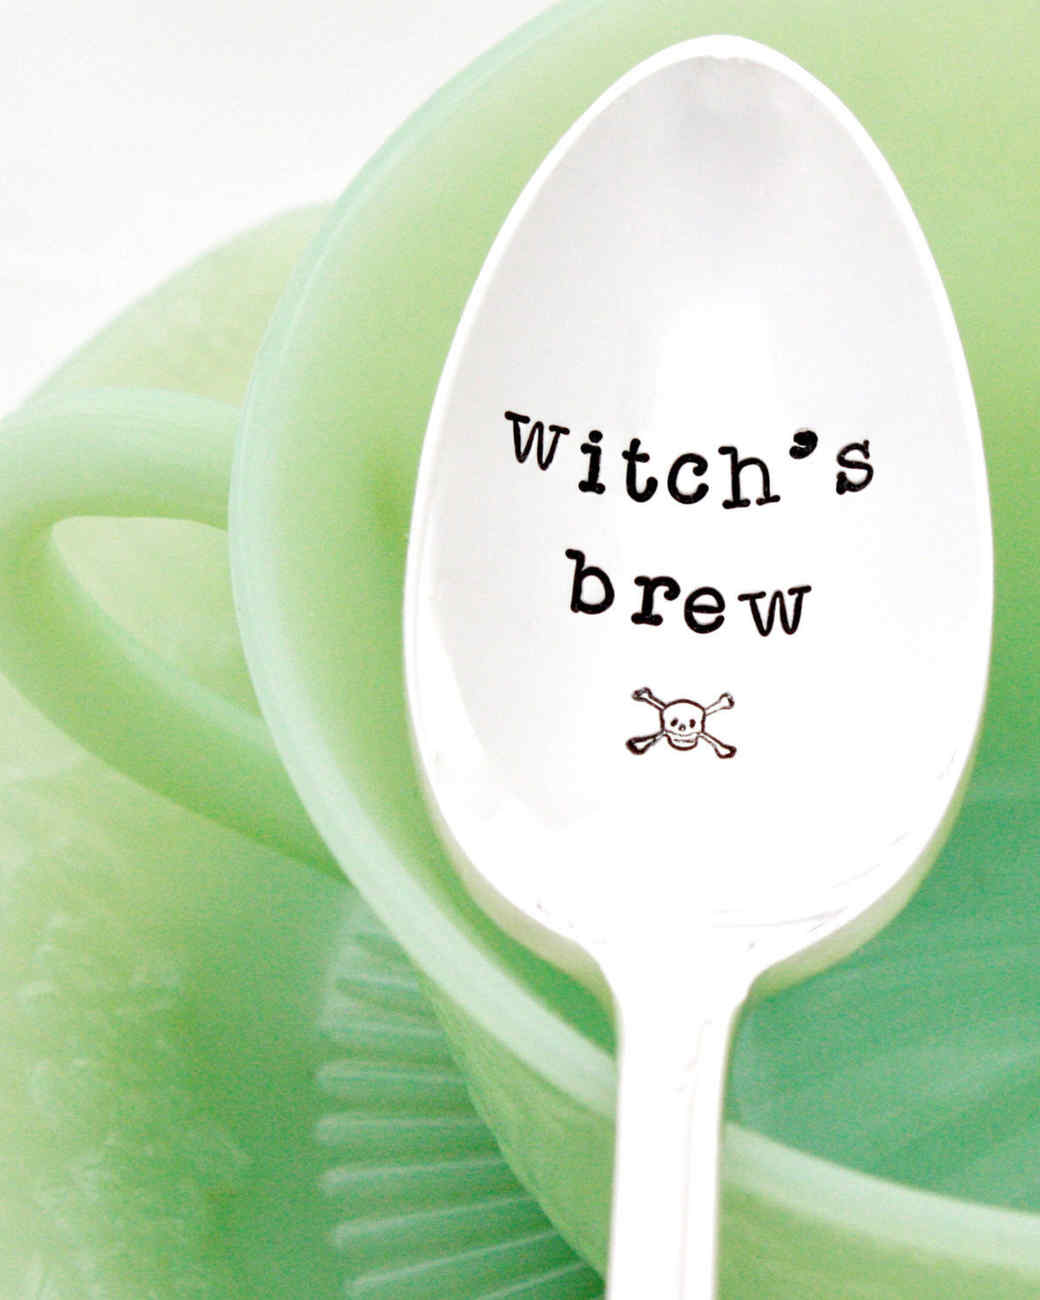 witchs-brew-milk-and-honey-luxury1014.jpg